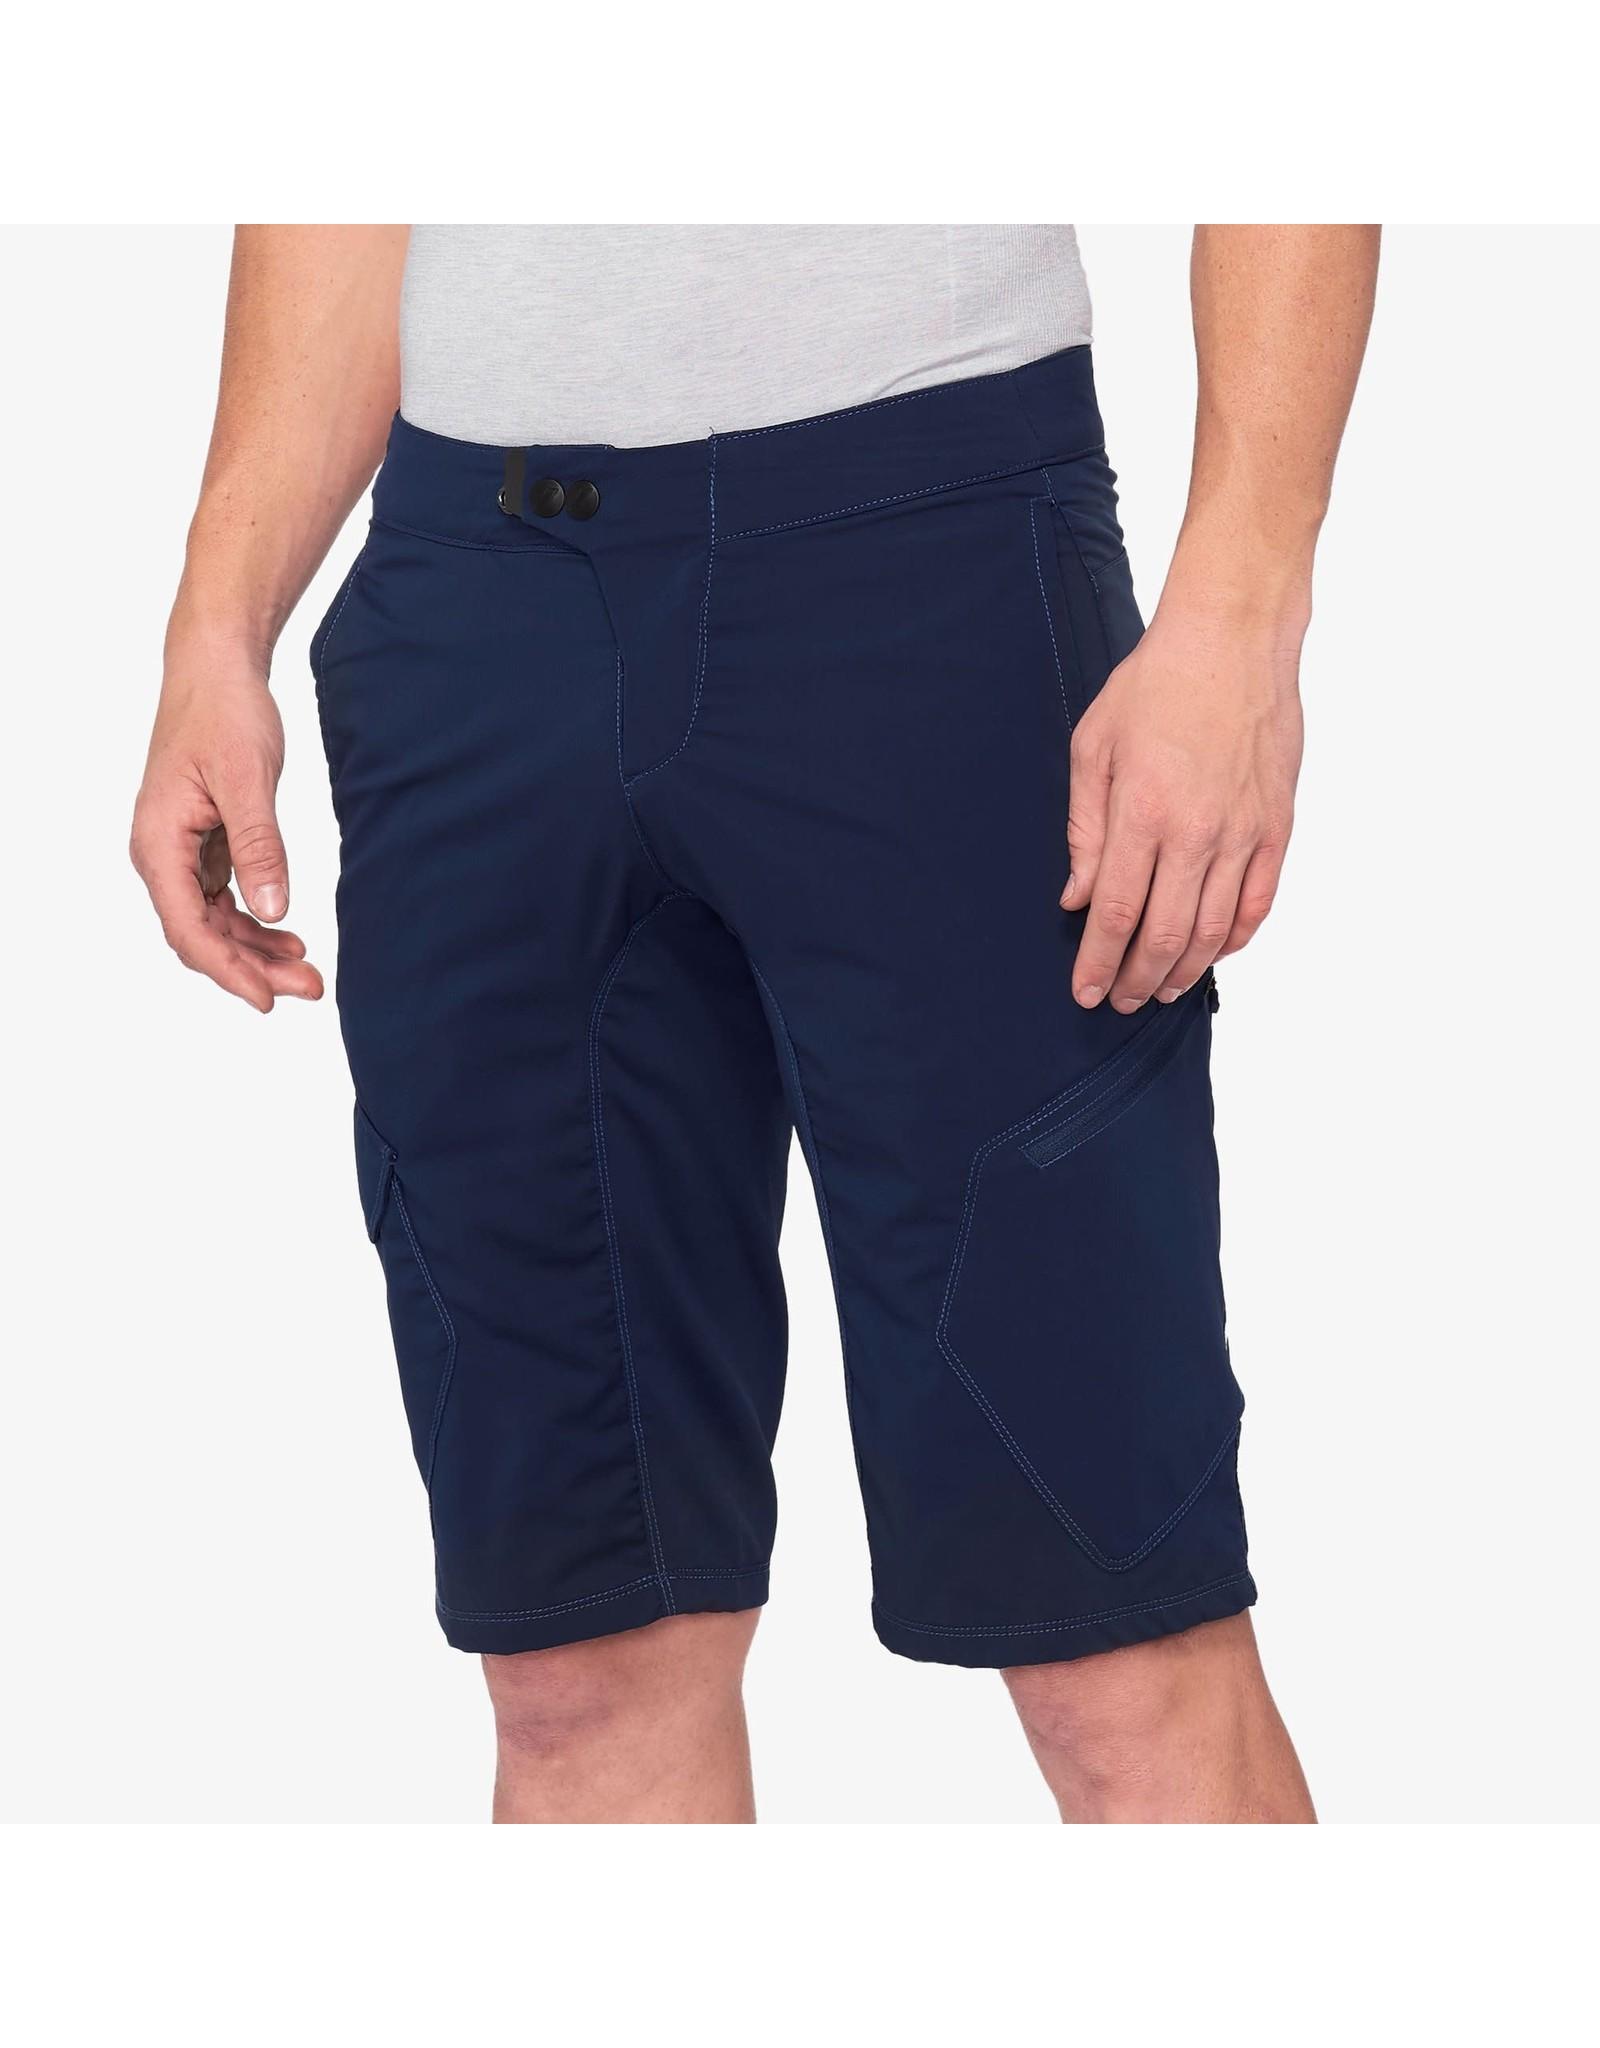 100% 100% - Men's RIDECAMP Shorts Navy - 38